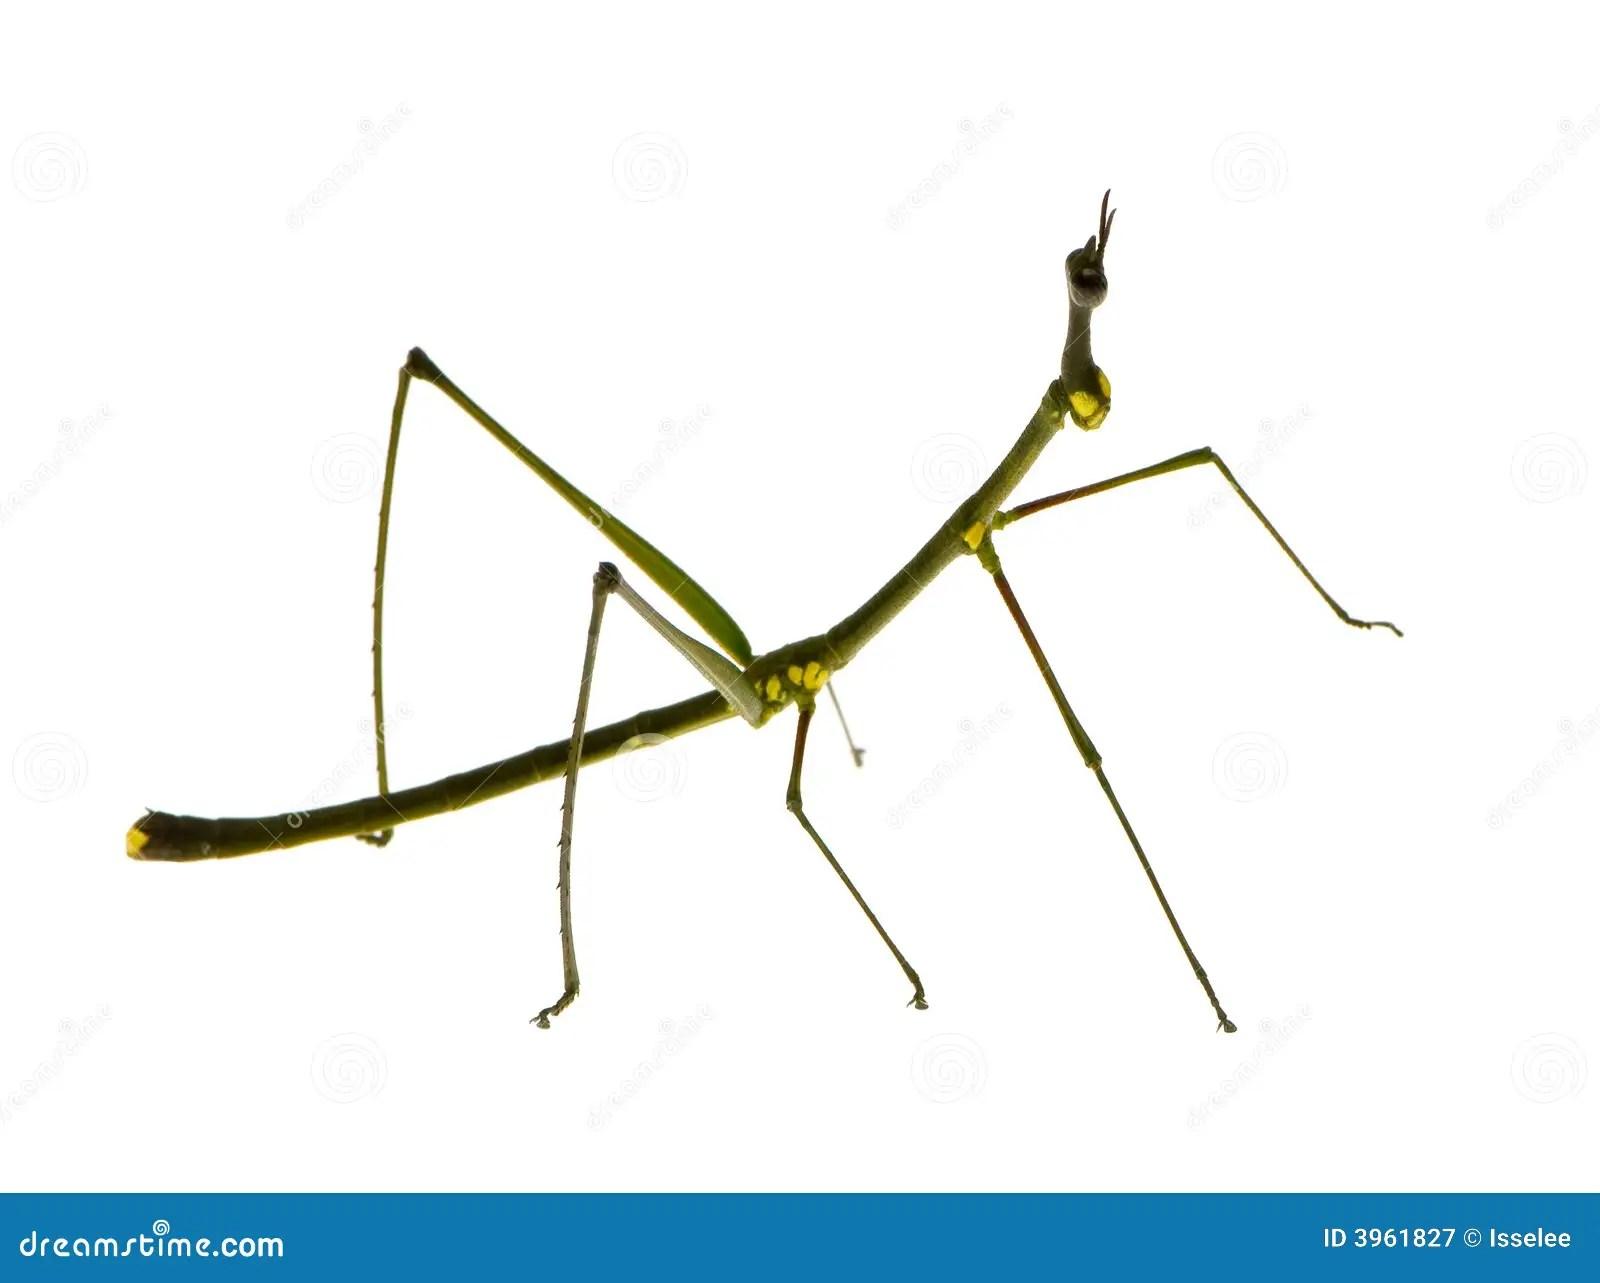 Stick Insect Phasmatodea